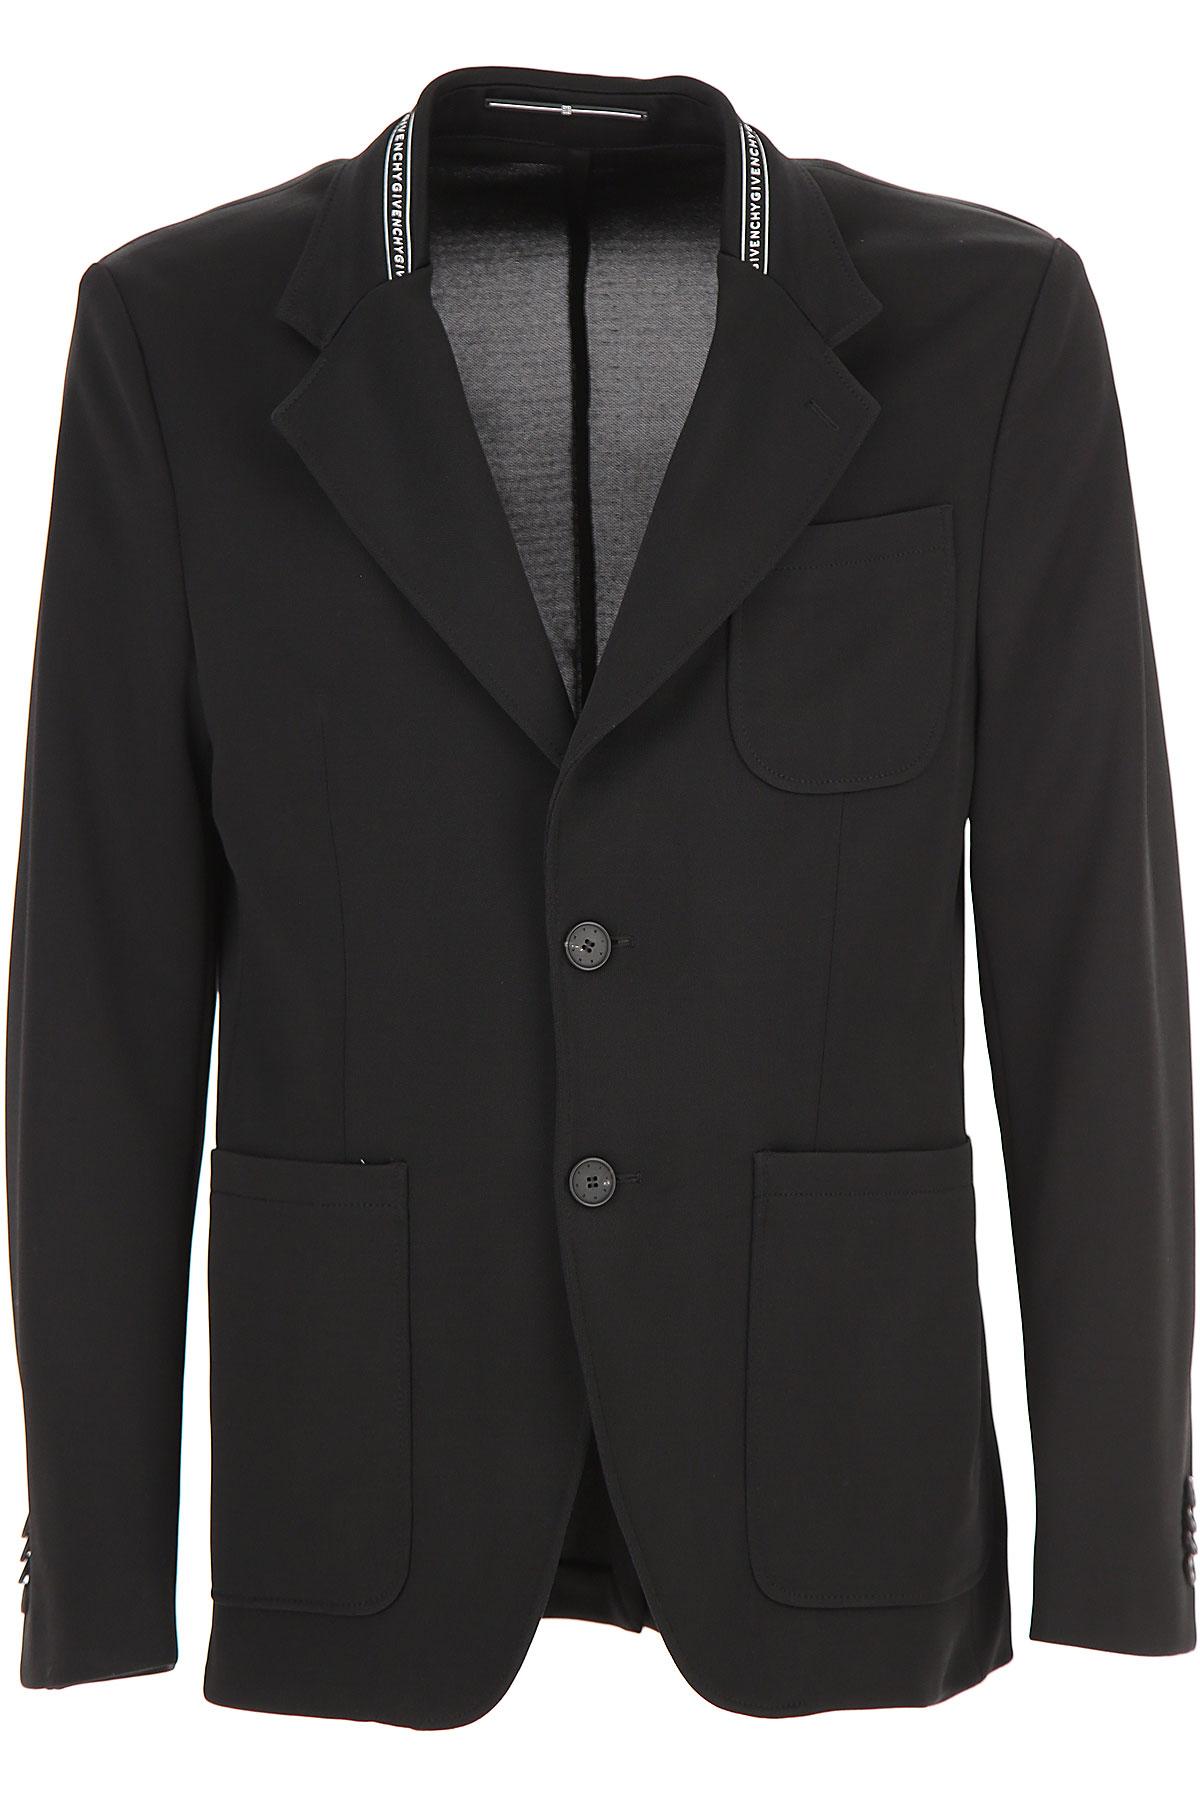 Givenchy Blazer for Men, Sport Coat, Black, Viscose, 2019, L M XL